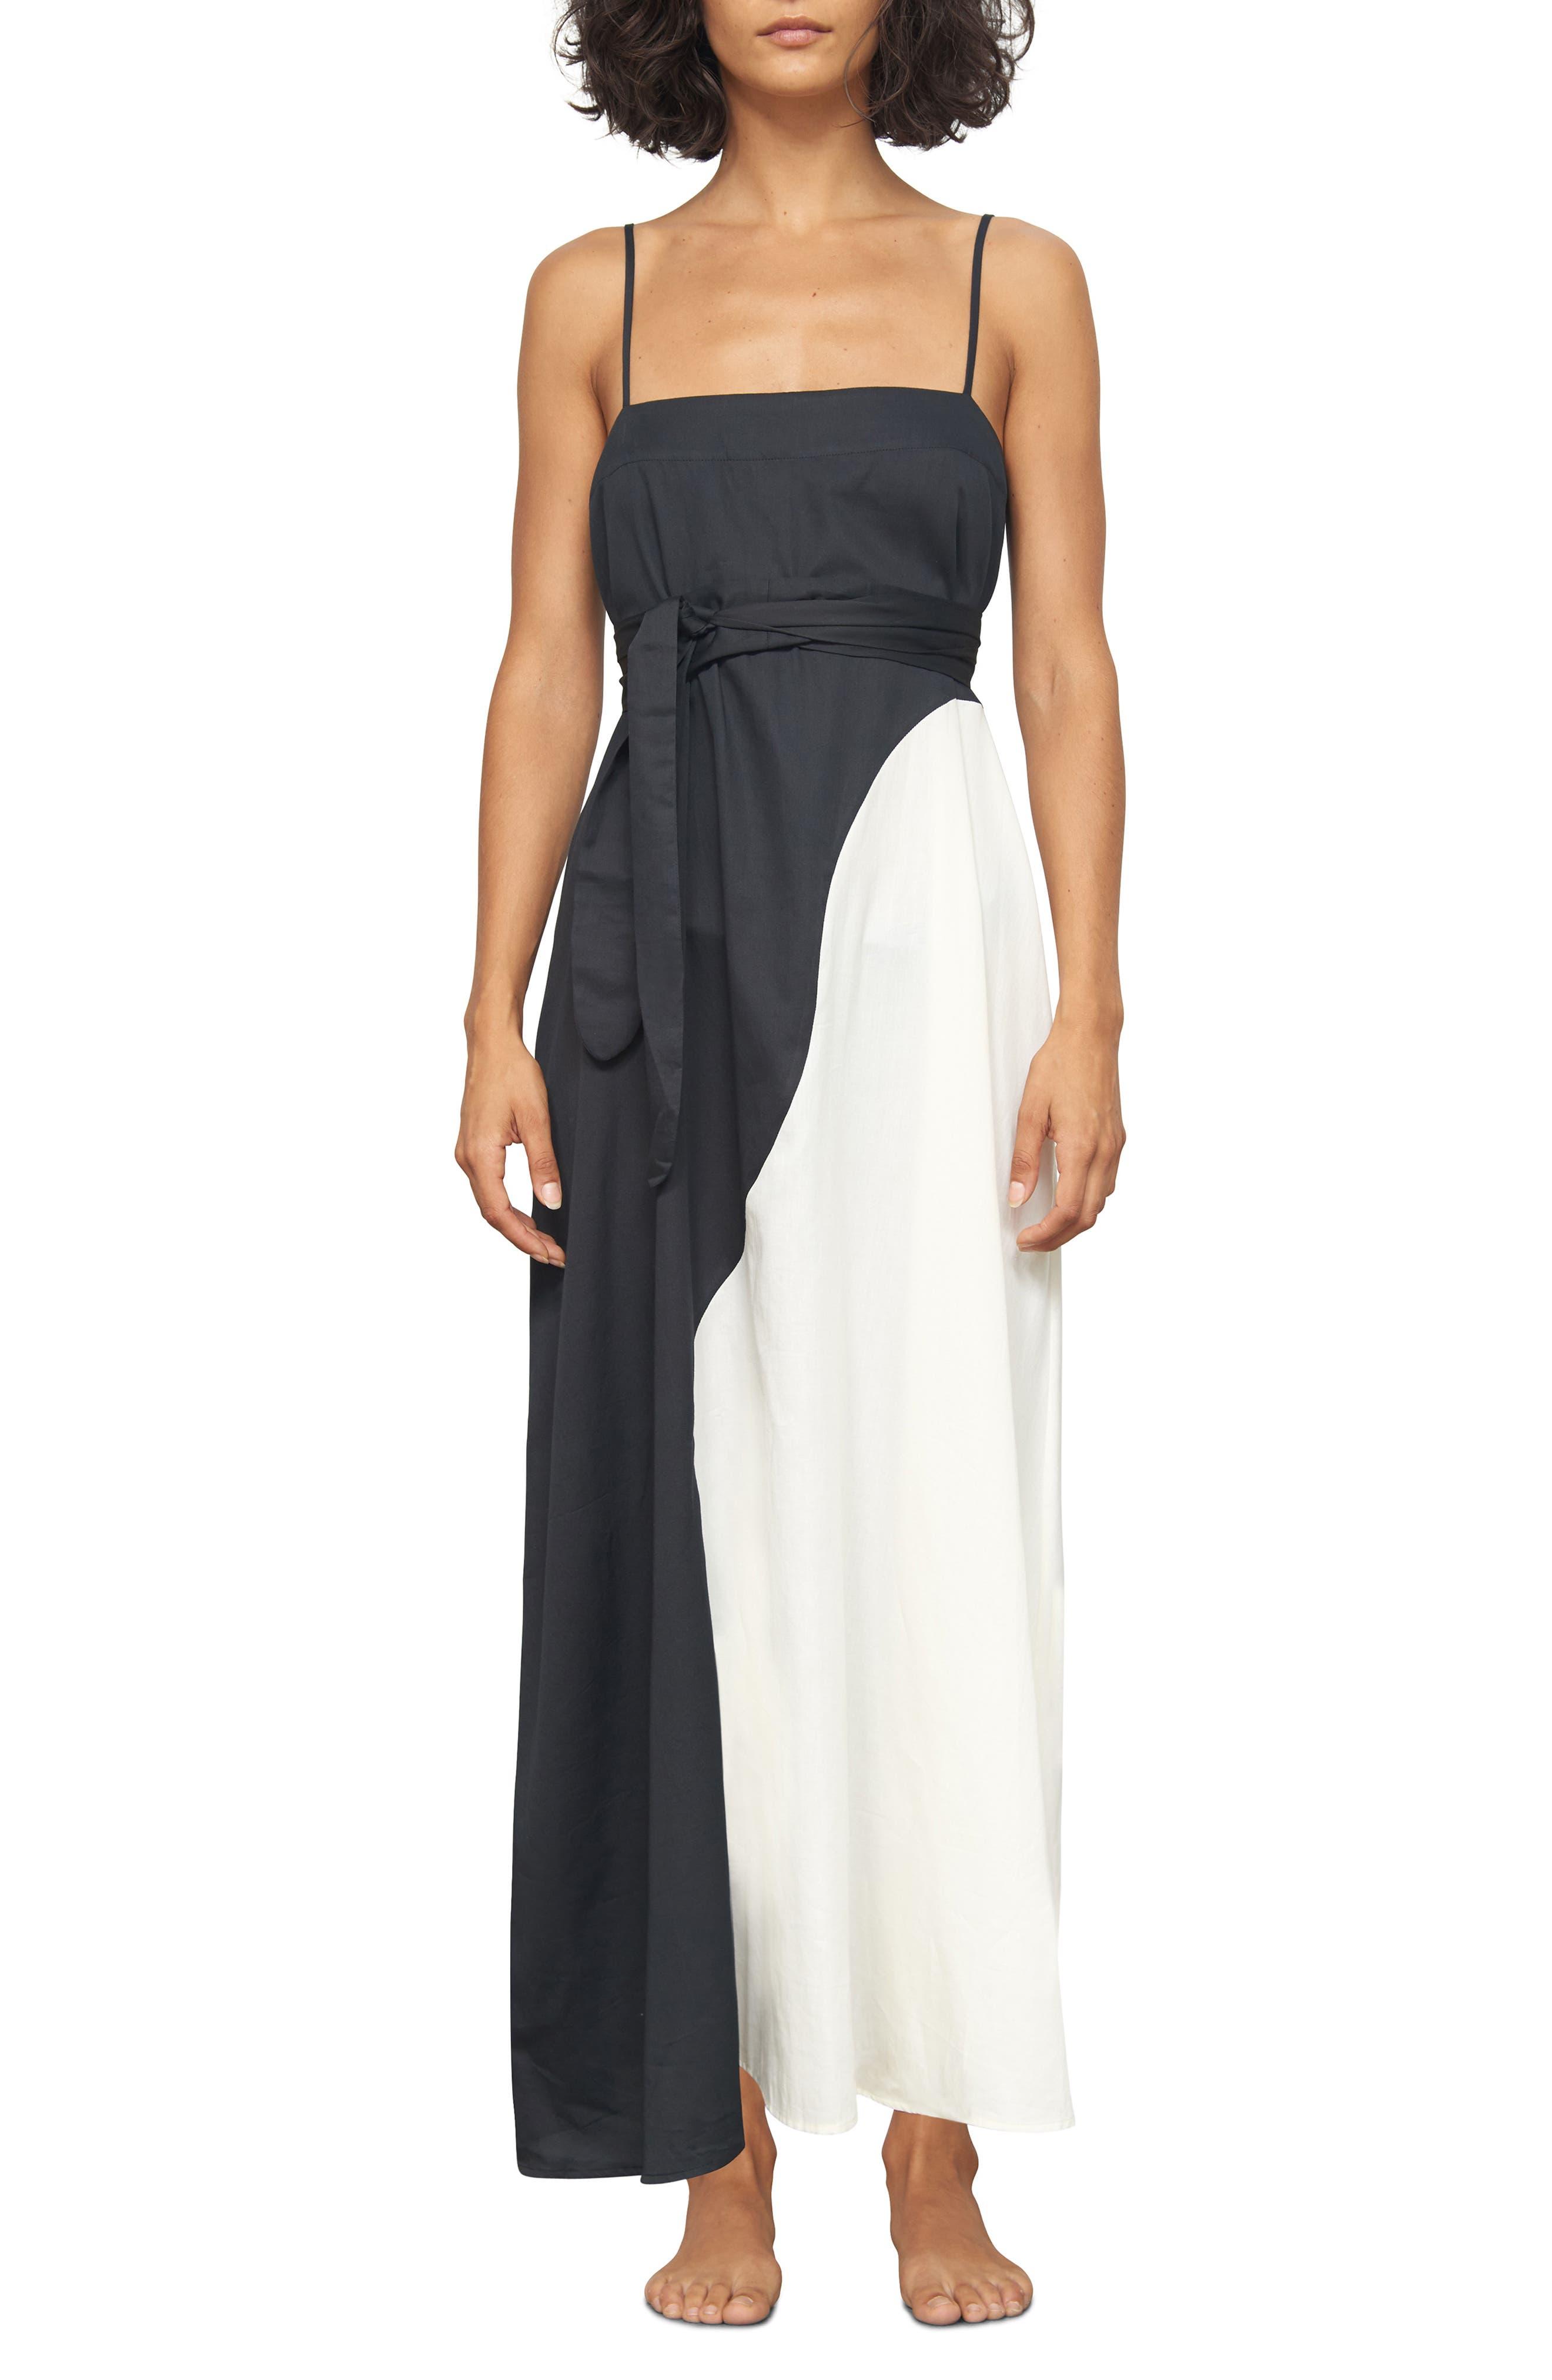 Mara Hoffman Philomena Organic Cotton Cover-Up Maxi Dress, Black